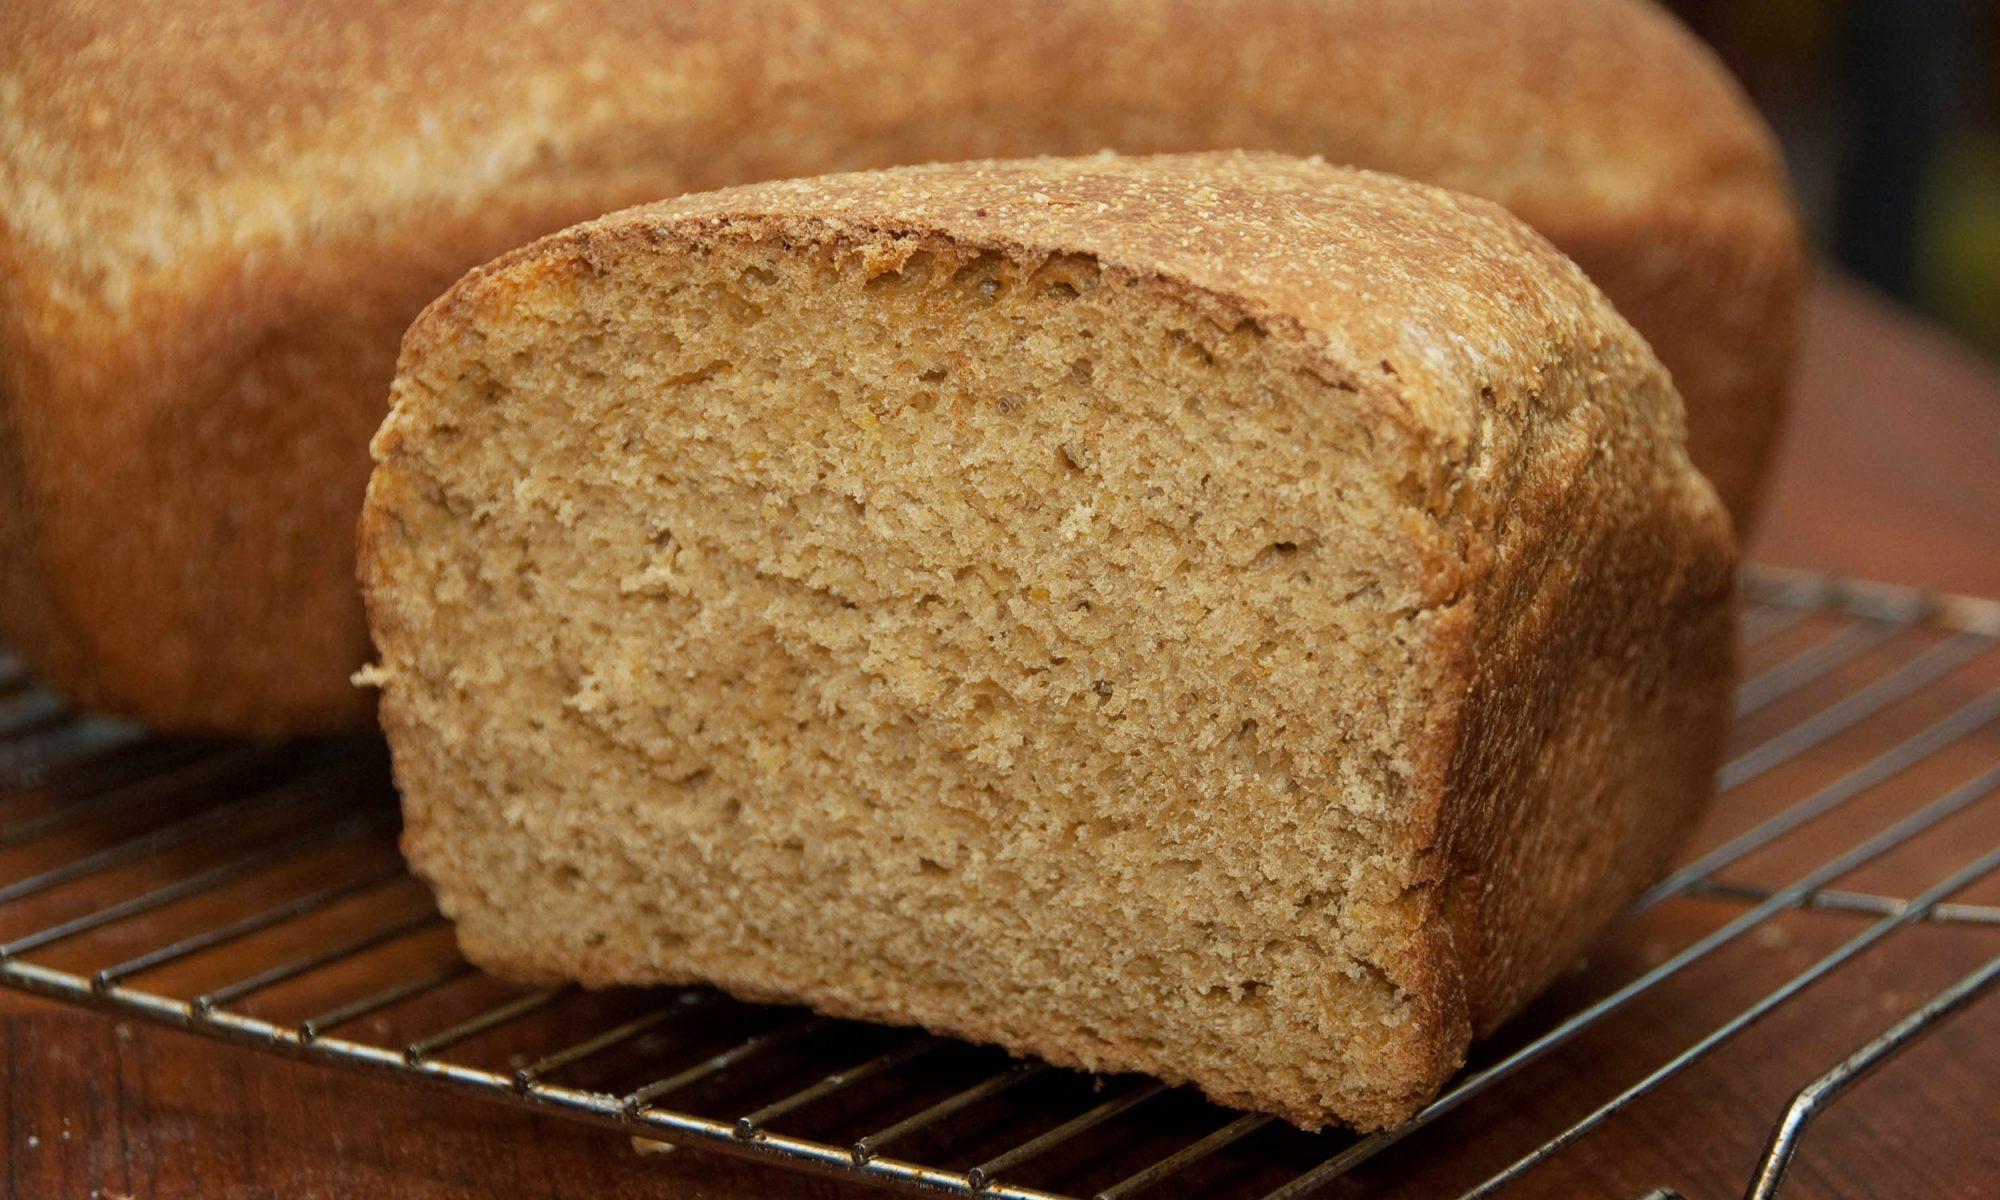 EC: How to Make Anadama Bread